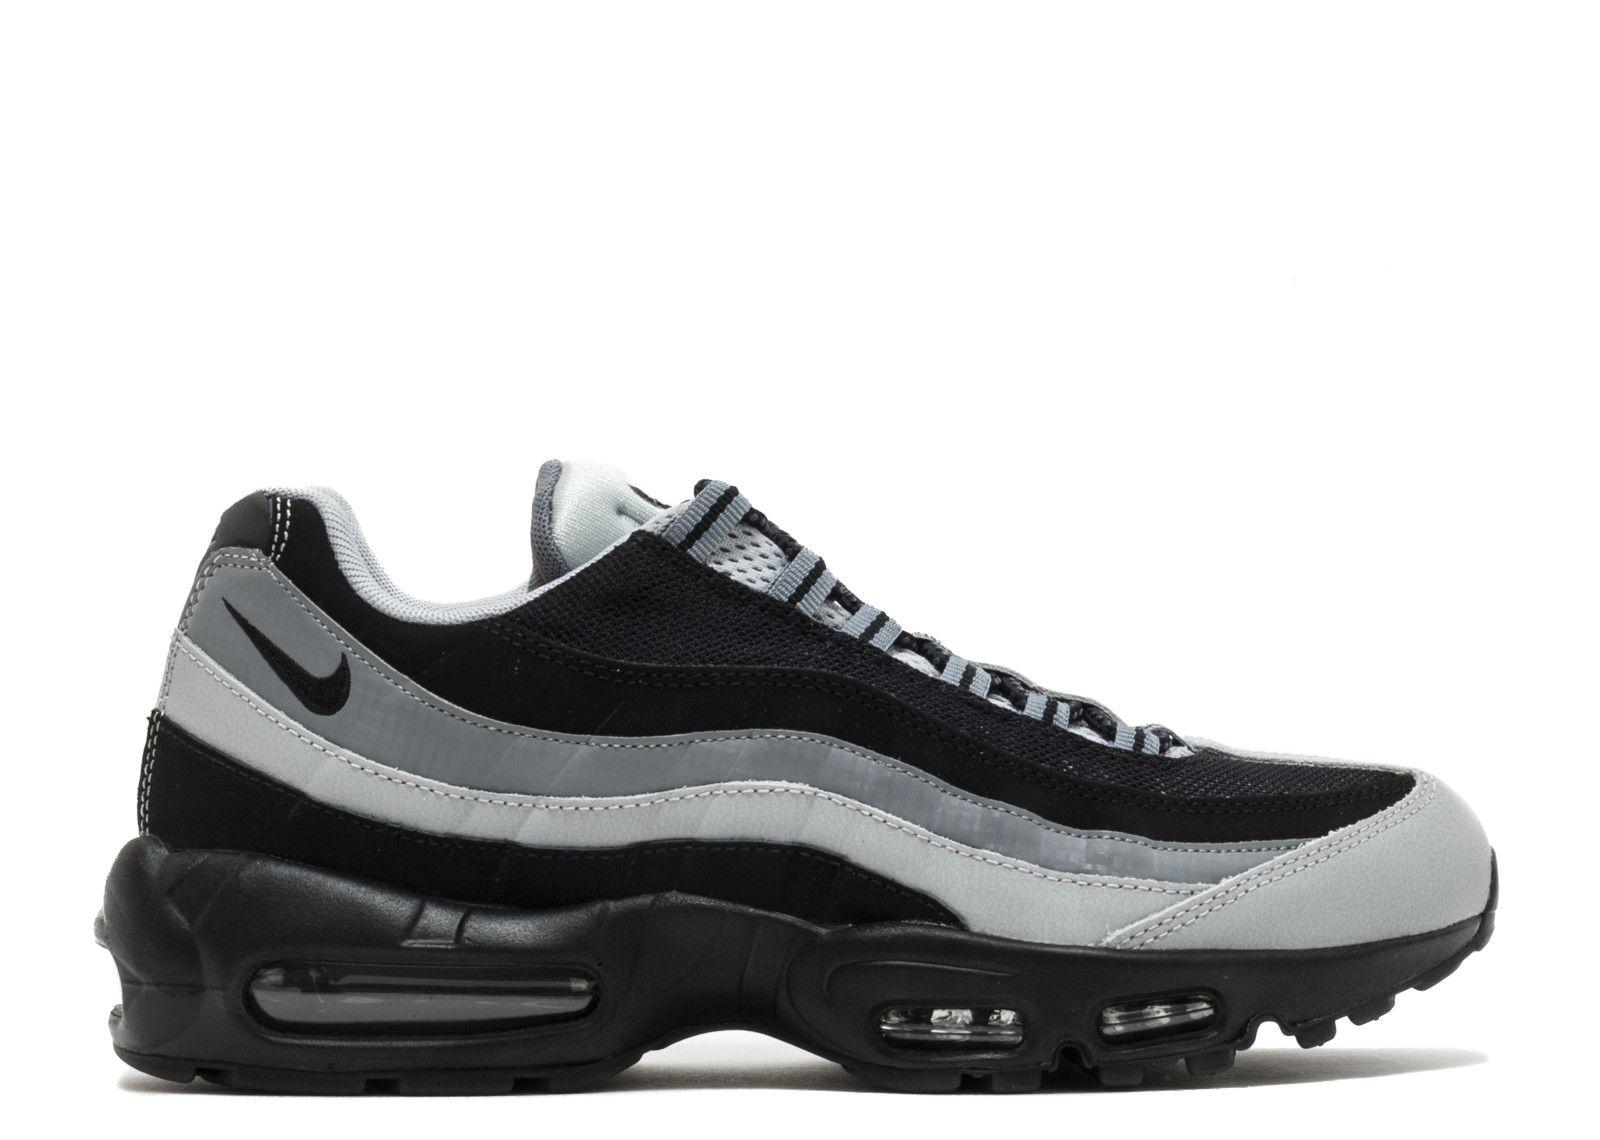 huge discount 77238 31da1 Sale Nike Air Max 95 Black Grey Charcoal Trainers Price